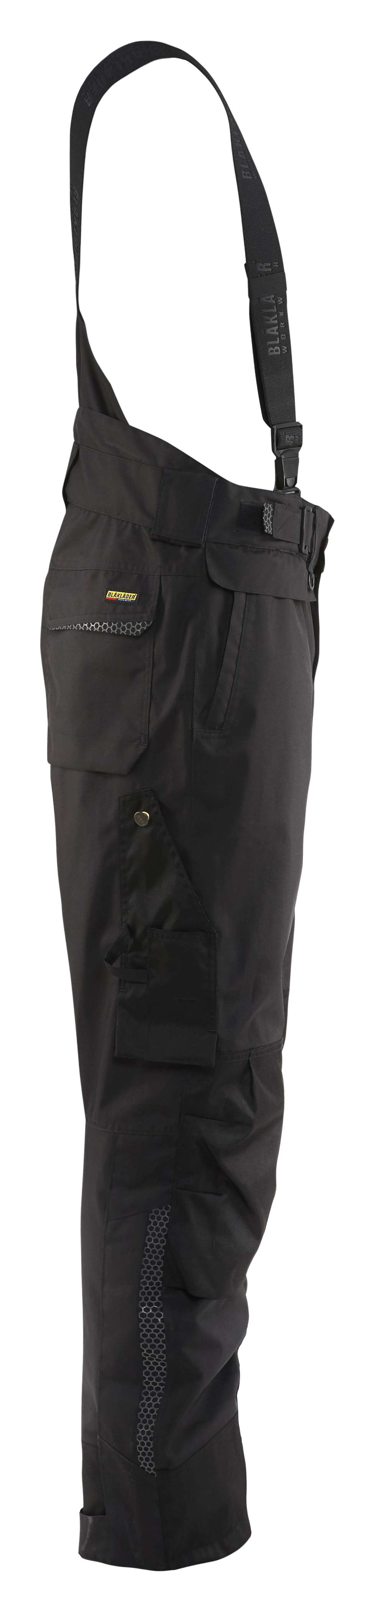 Blaklader Regenbroeken 18091977 Losse bretels zwart(9900)